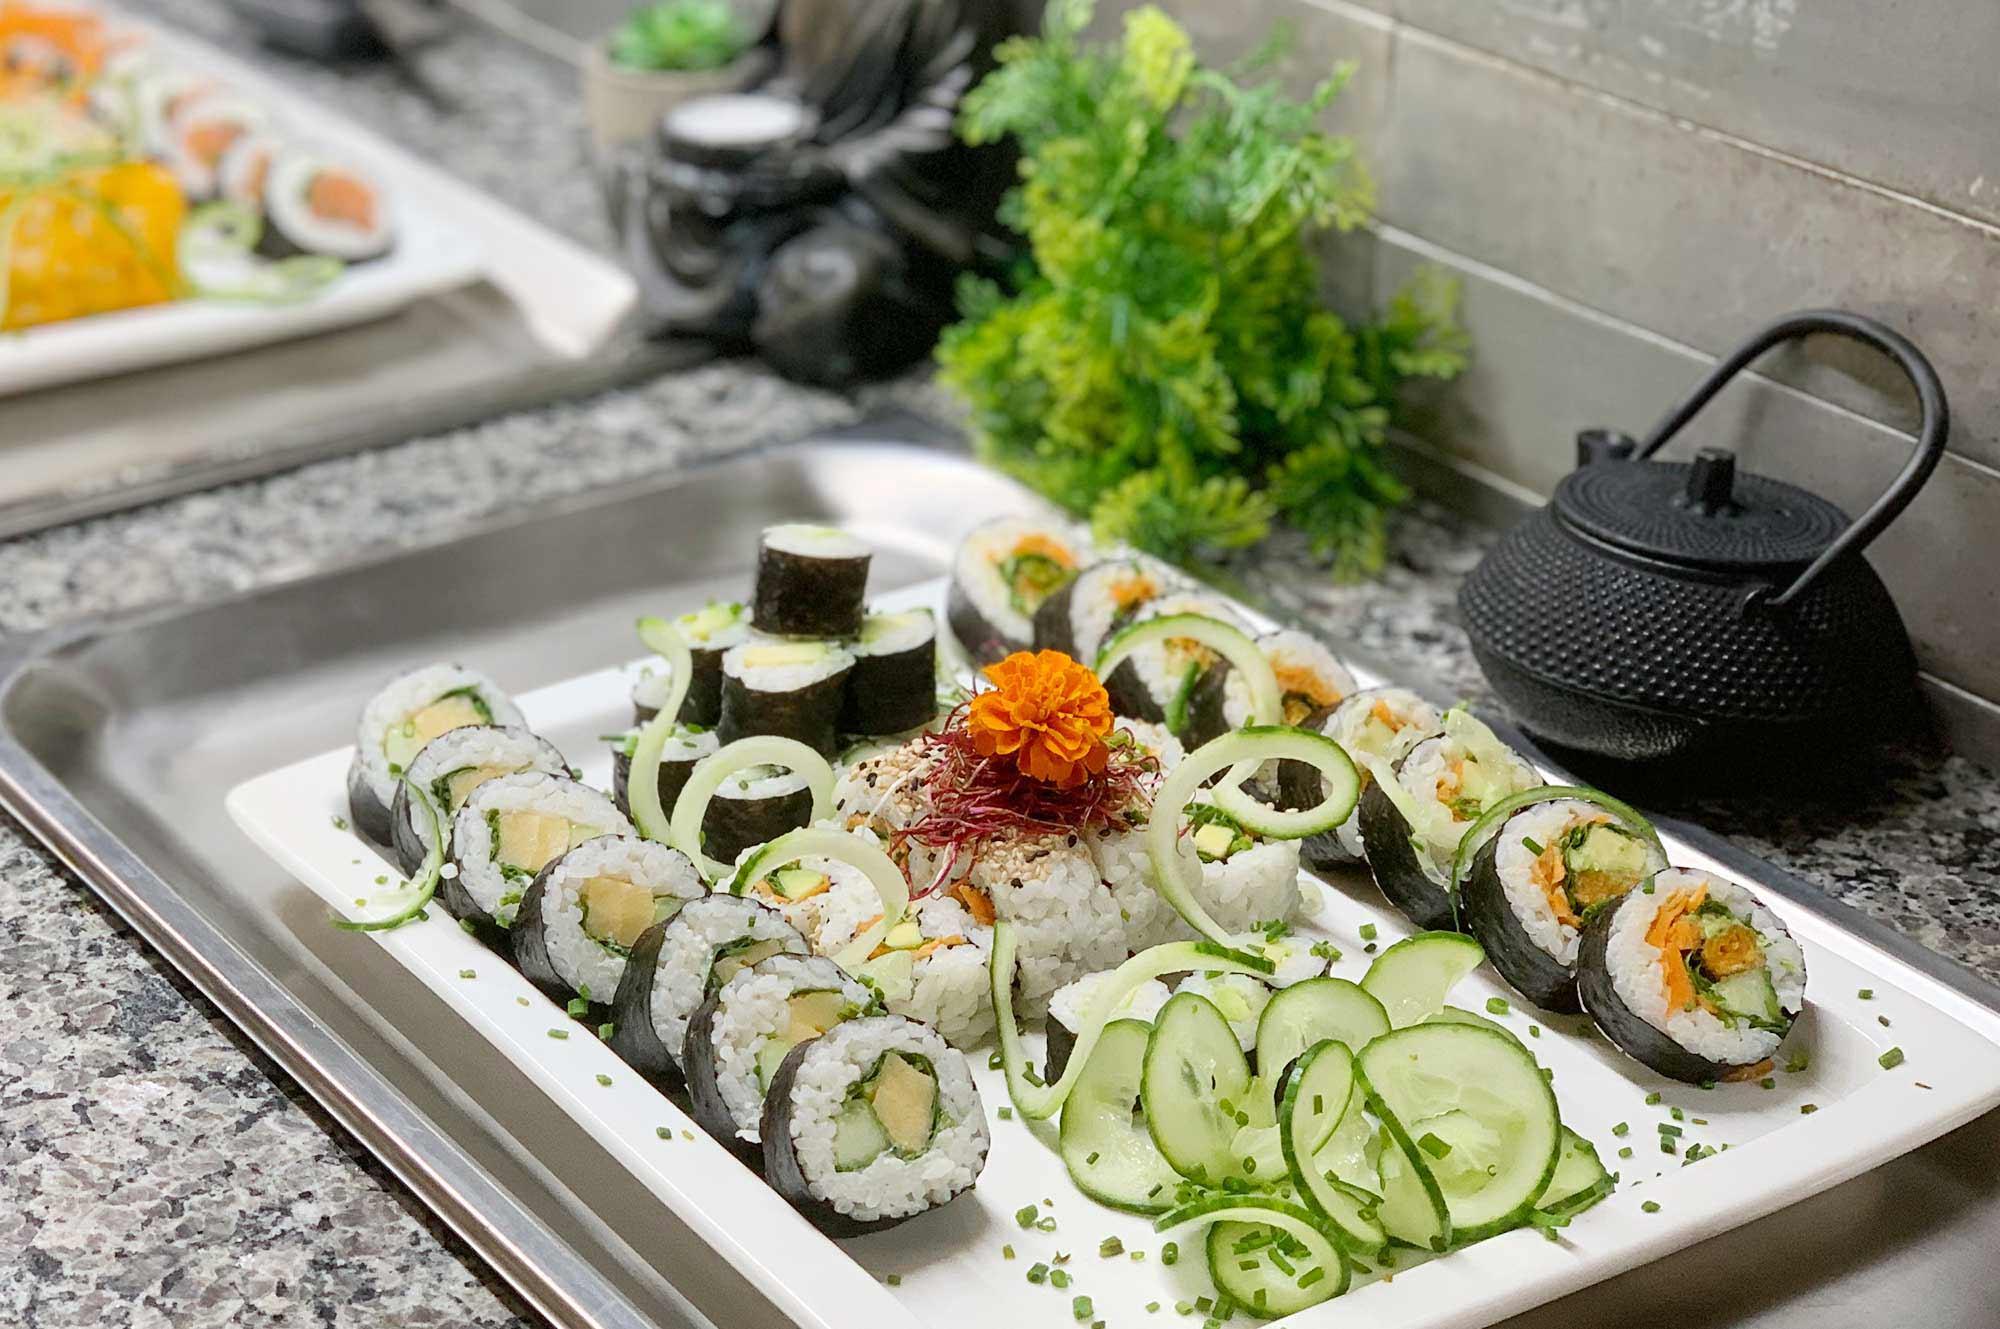 Sushifreunde | All You Can Eat Buffet